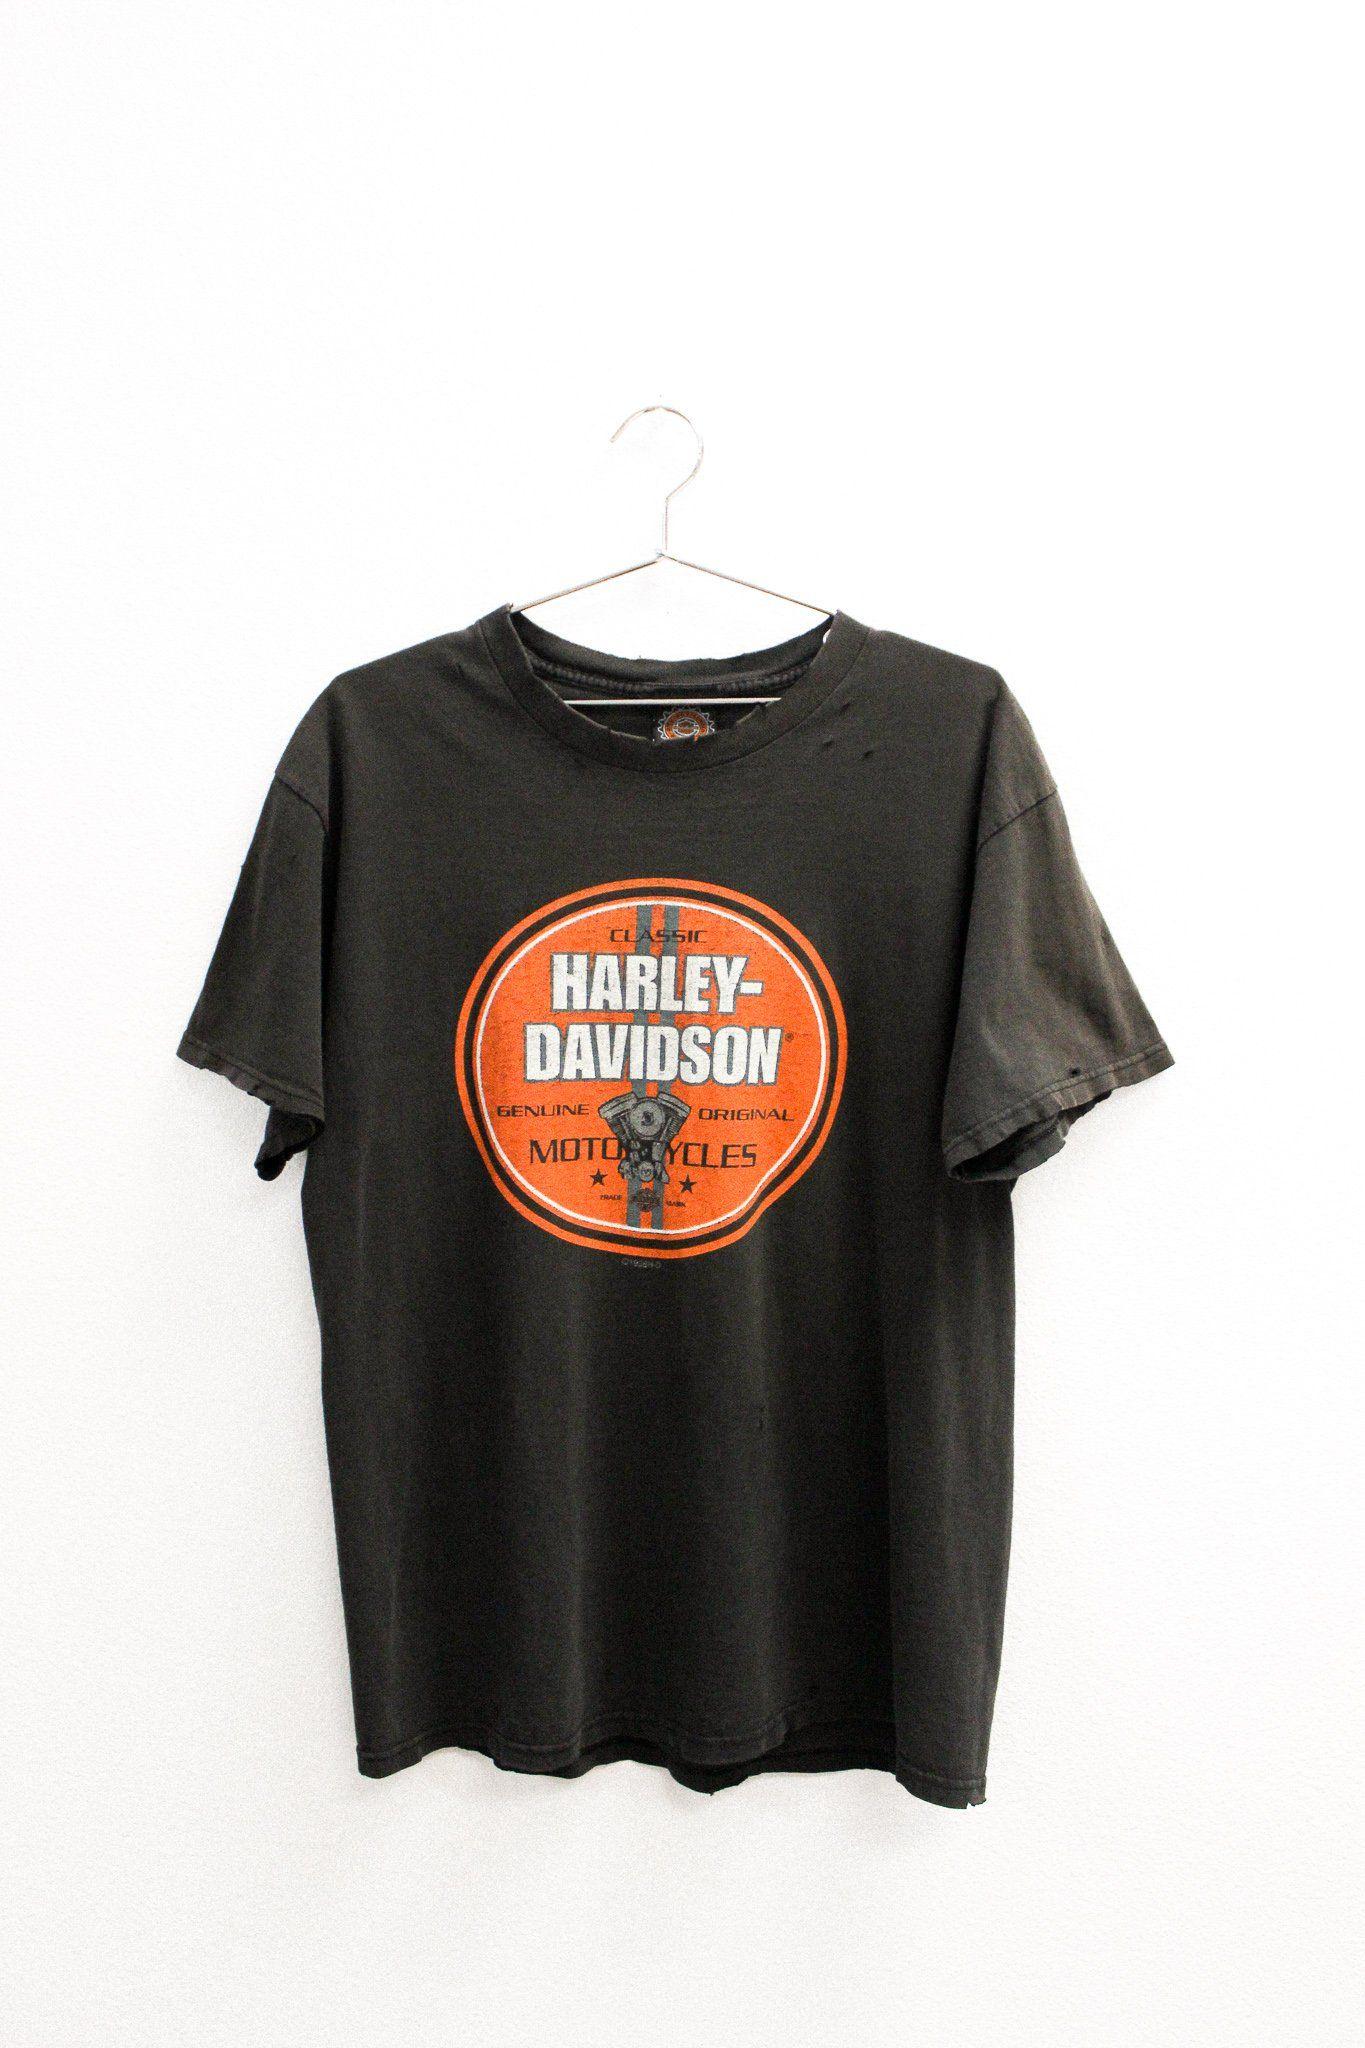 Harley-Davidson subtle graphic tee